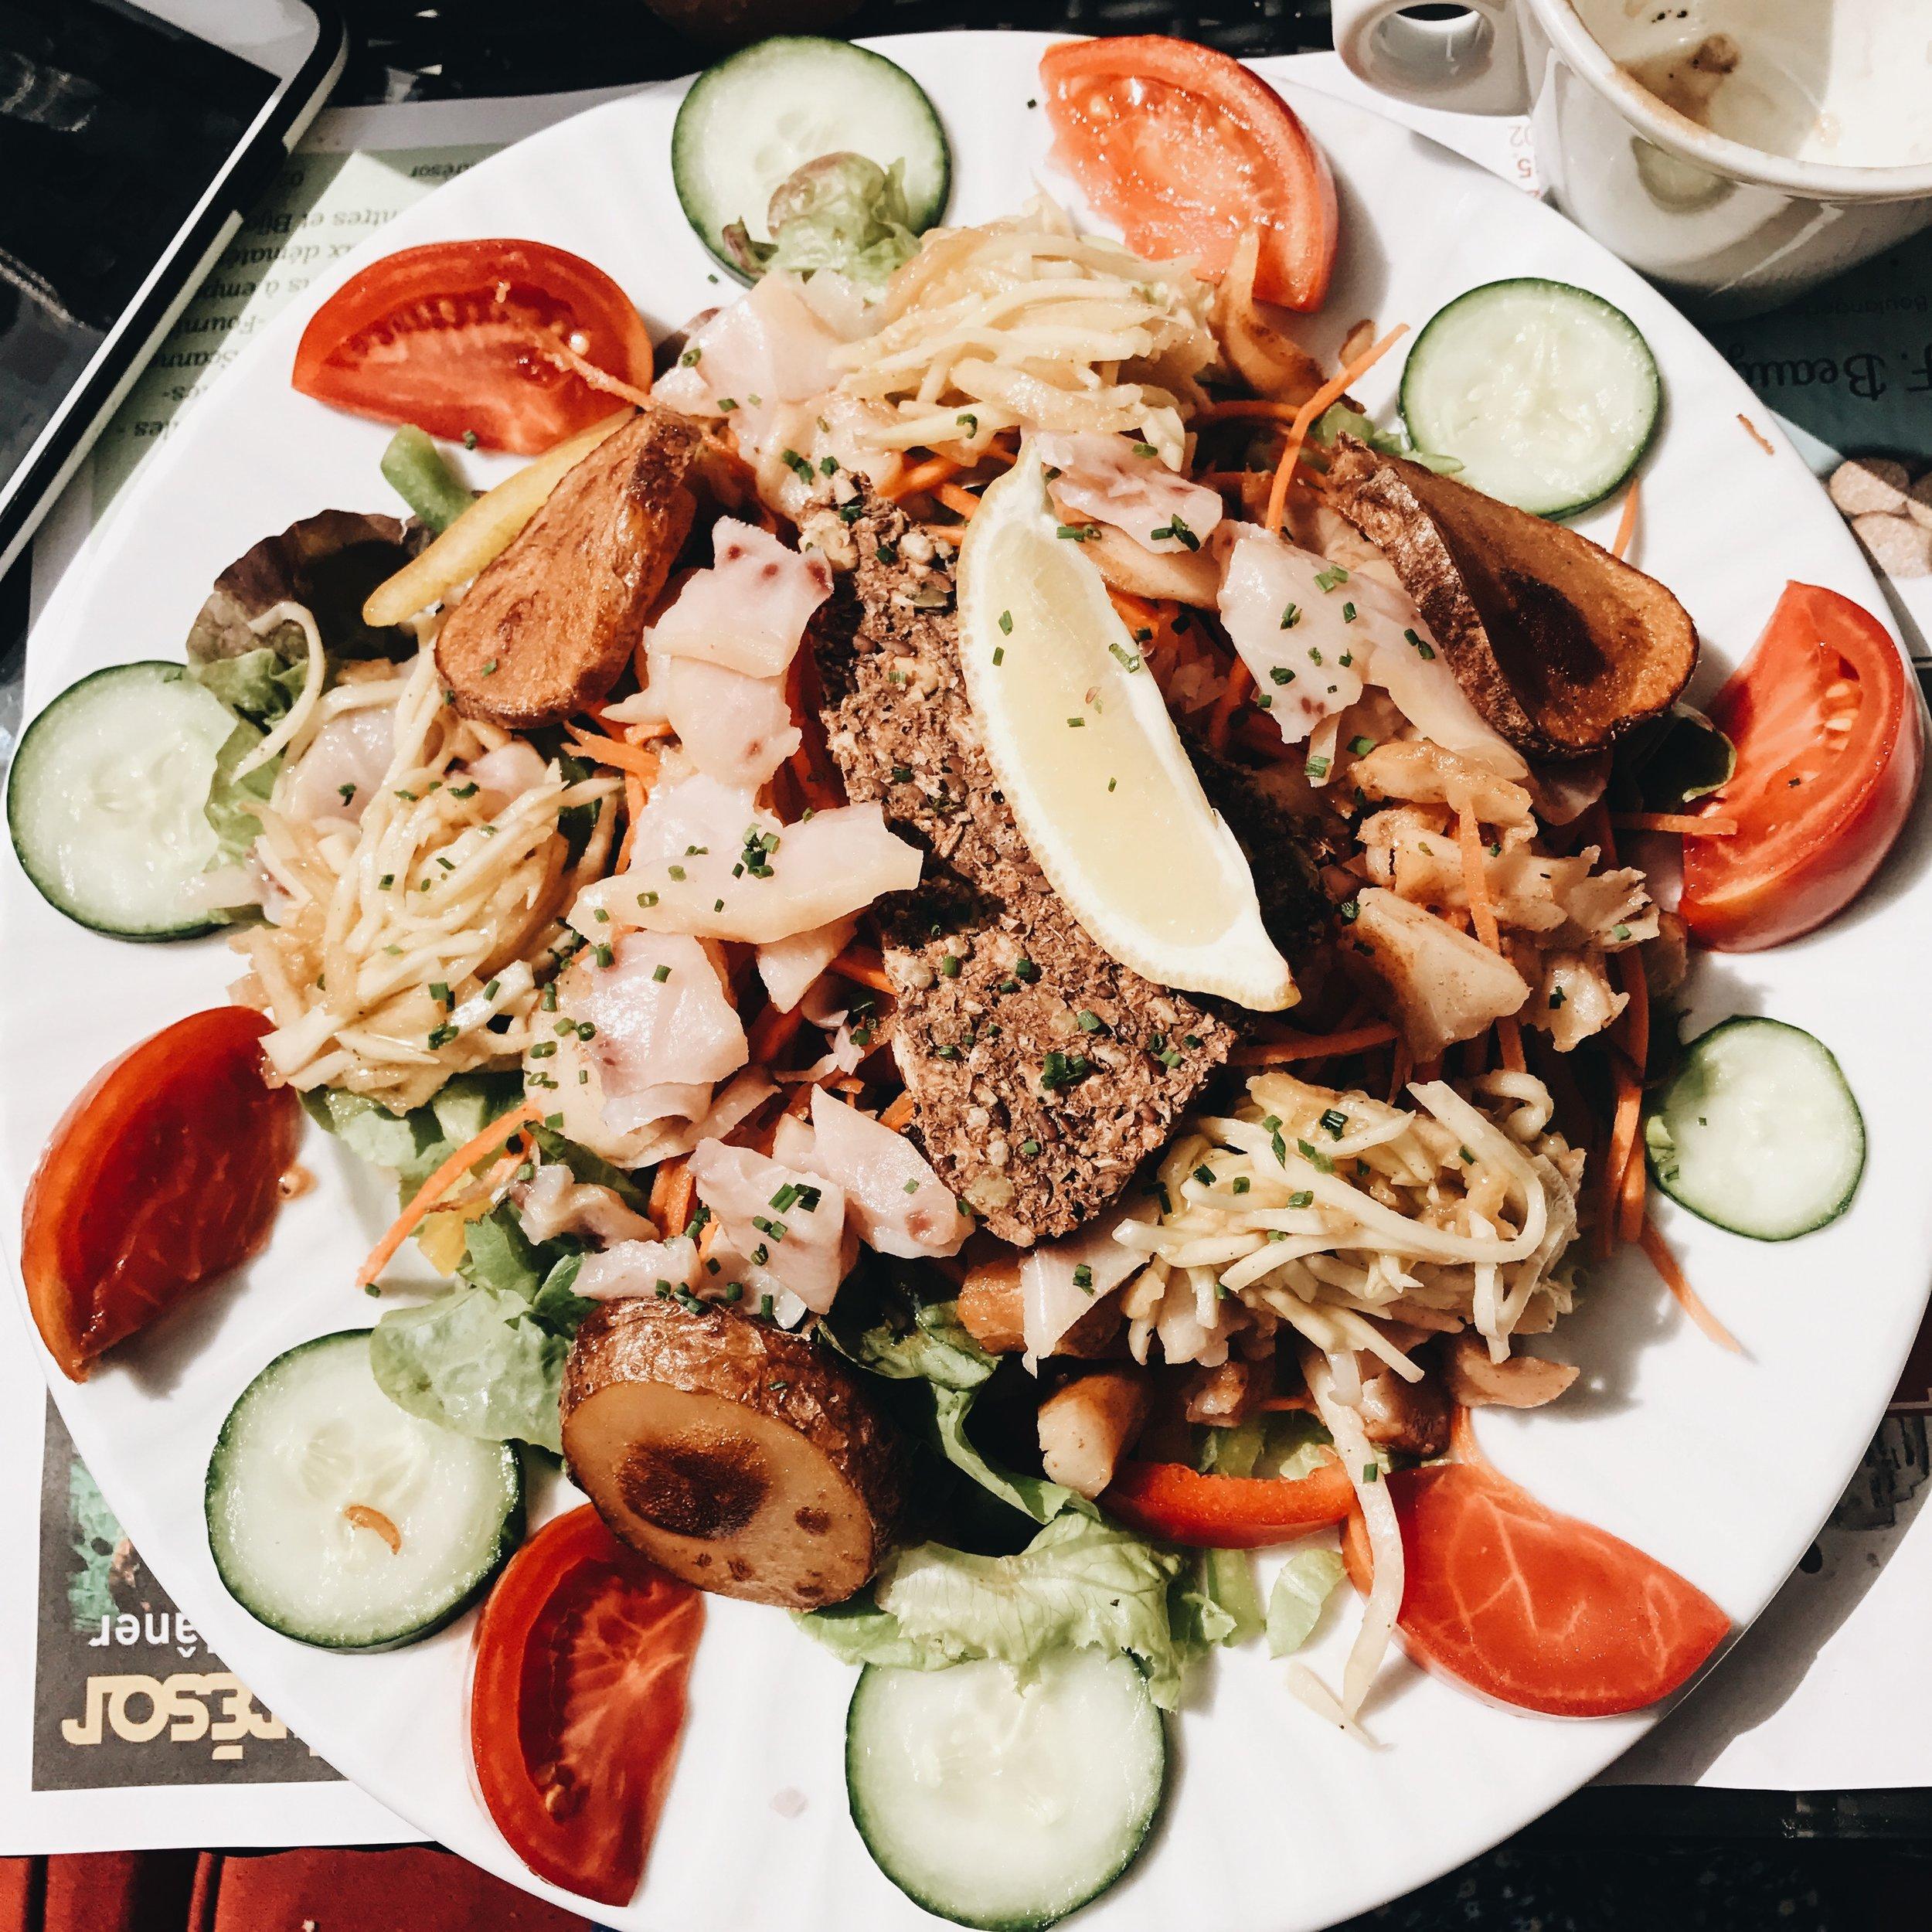 montresore salad.JPG